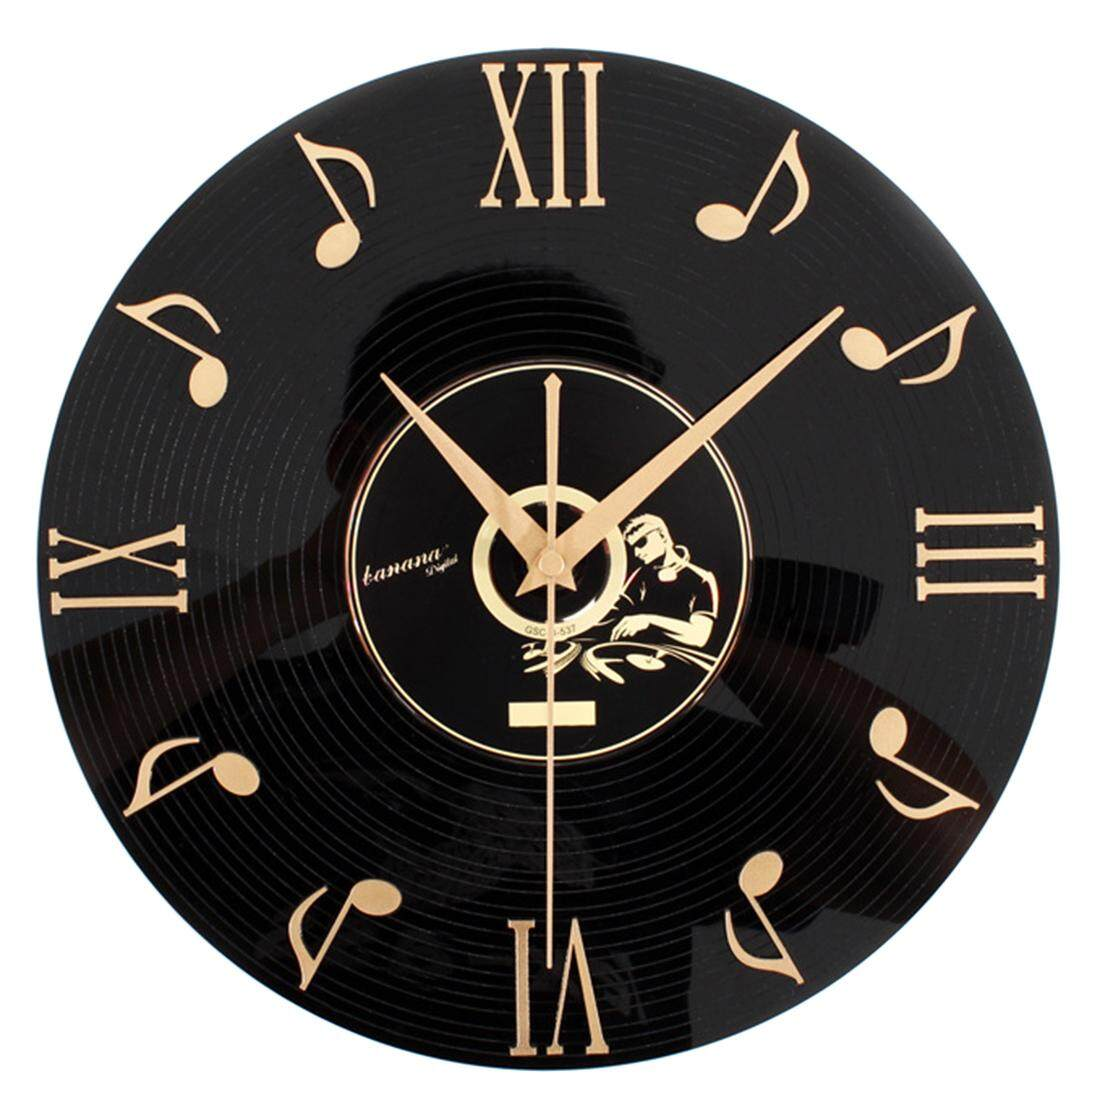 360DSC Fashion Creative Retro Wall Clock Music Notes Three - Dimensional Vinyl CD Album Clock - Black - intl